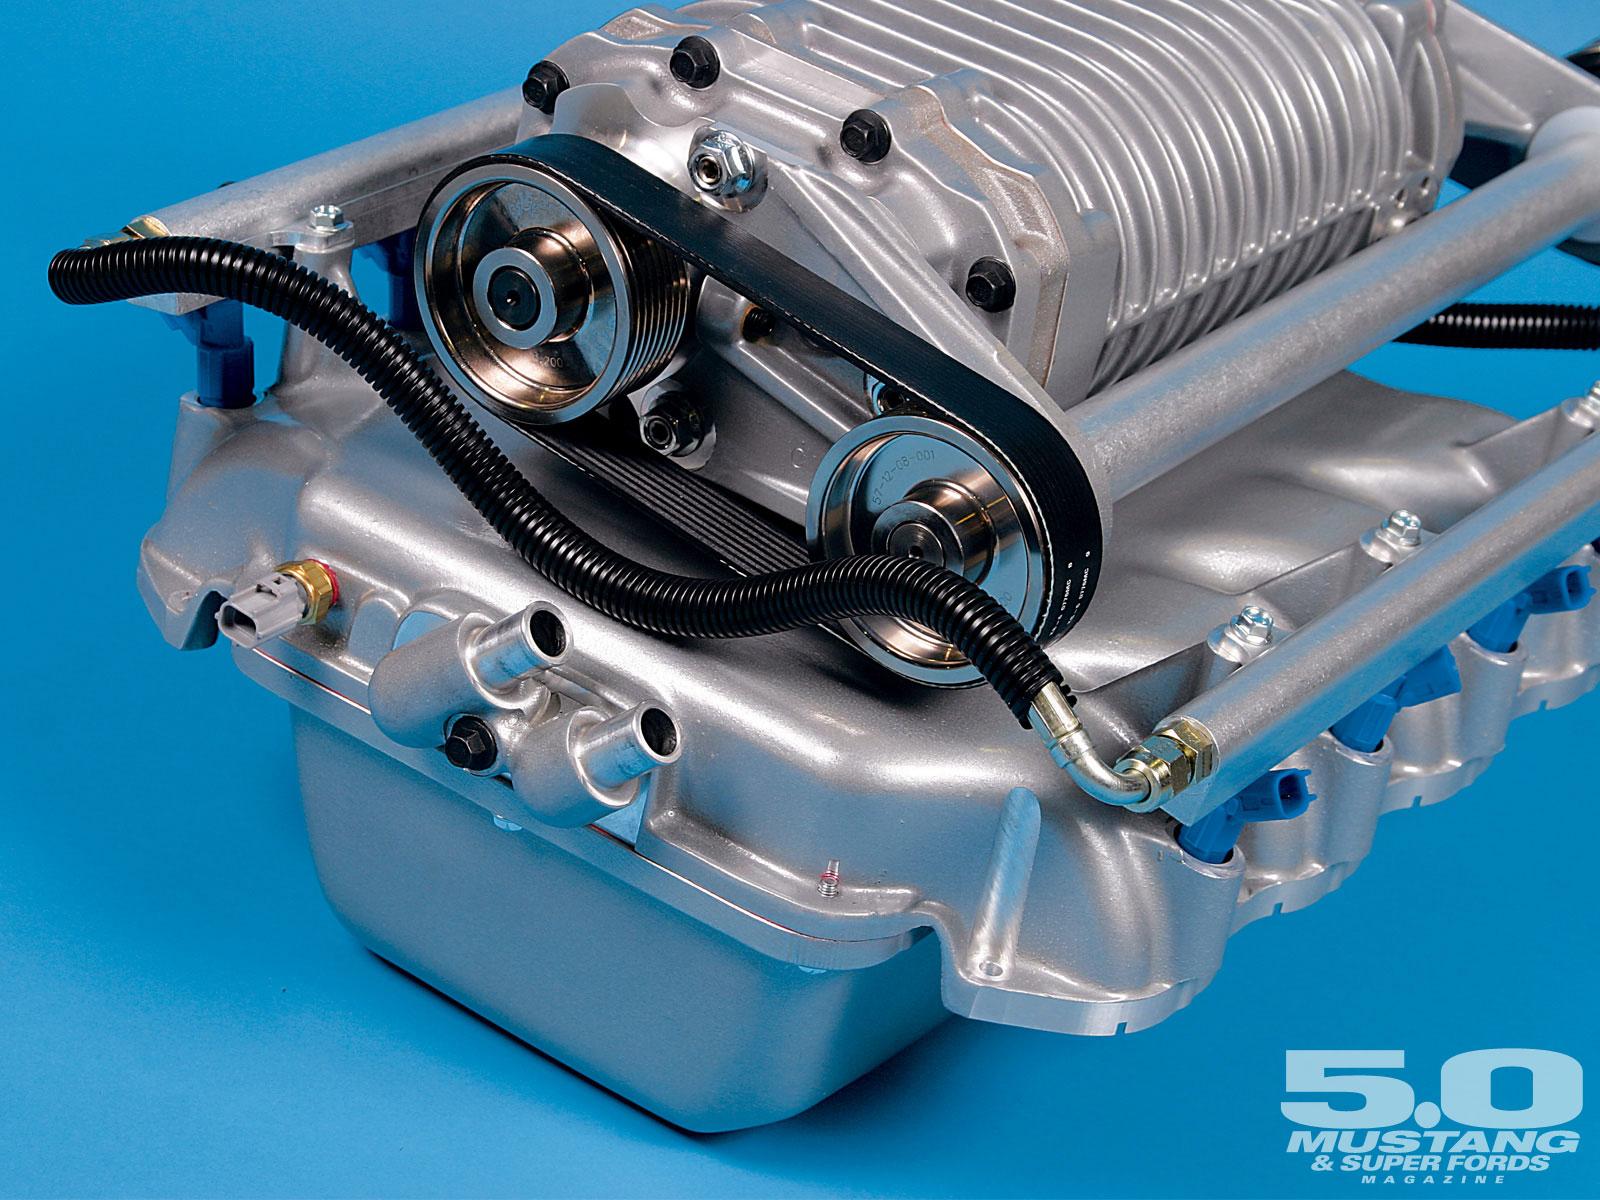 M5lp 0704 03 O Magnacharger Intercooled Supercharger Blower